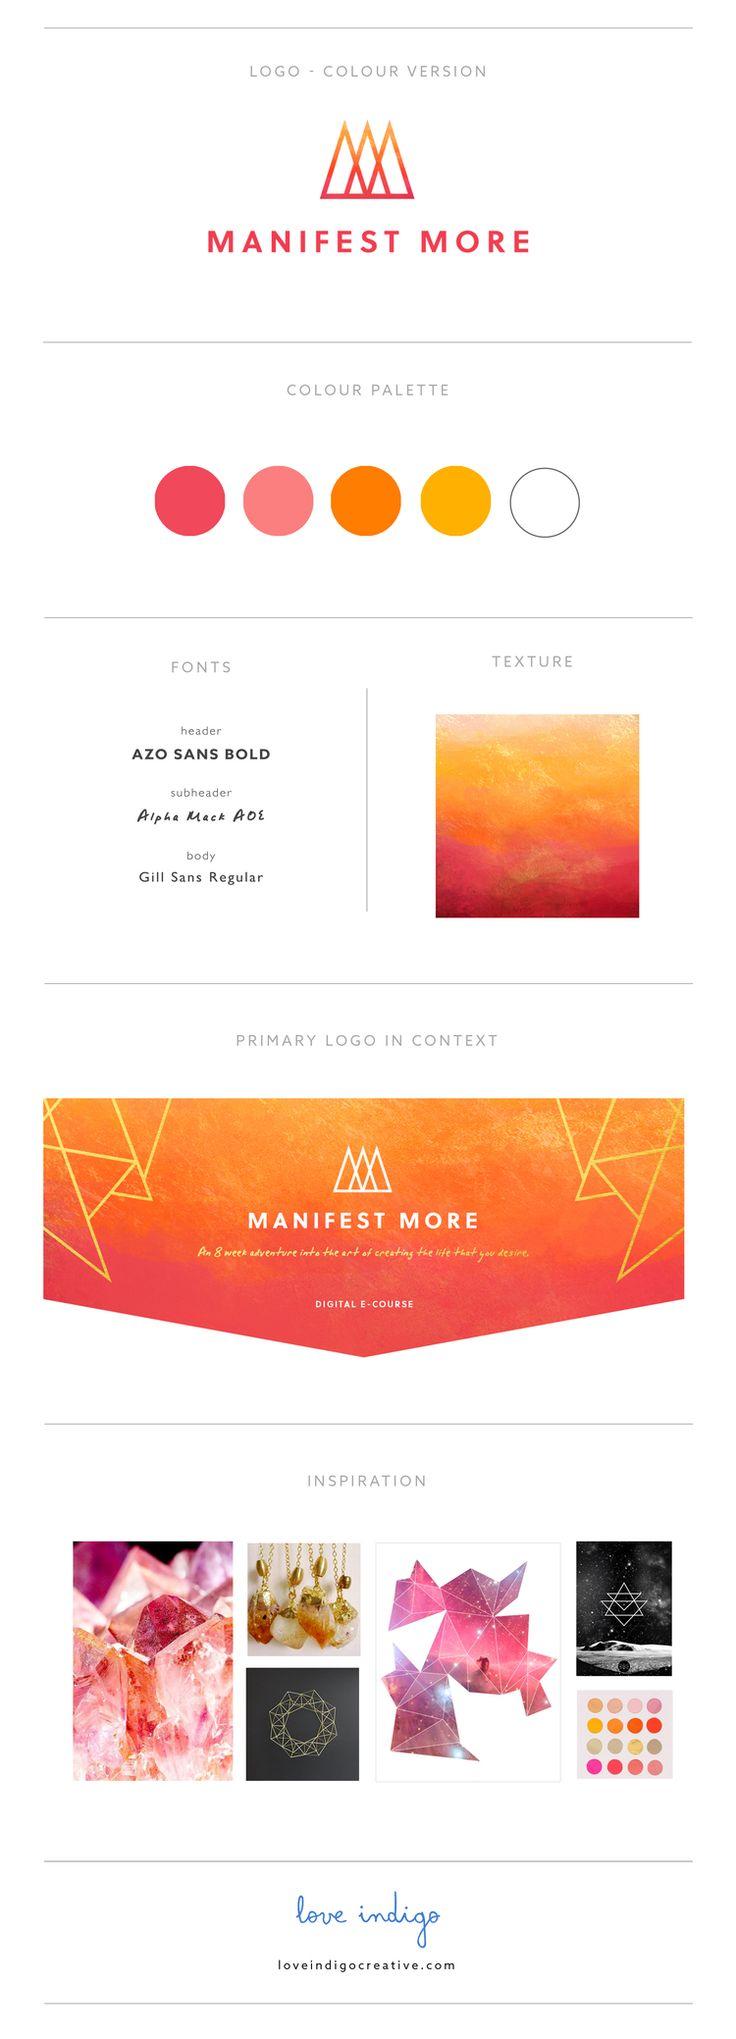 Manifiest More Brand Guide - Love Indigo Creative